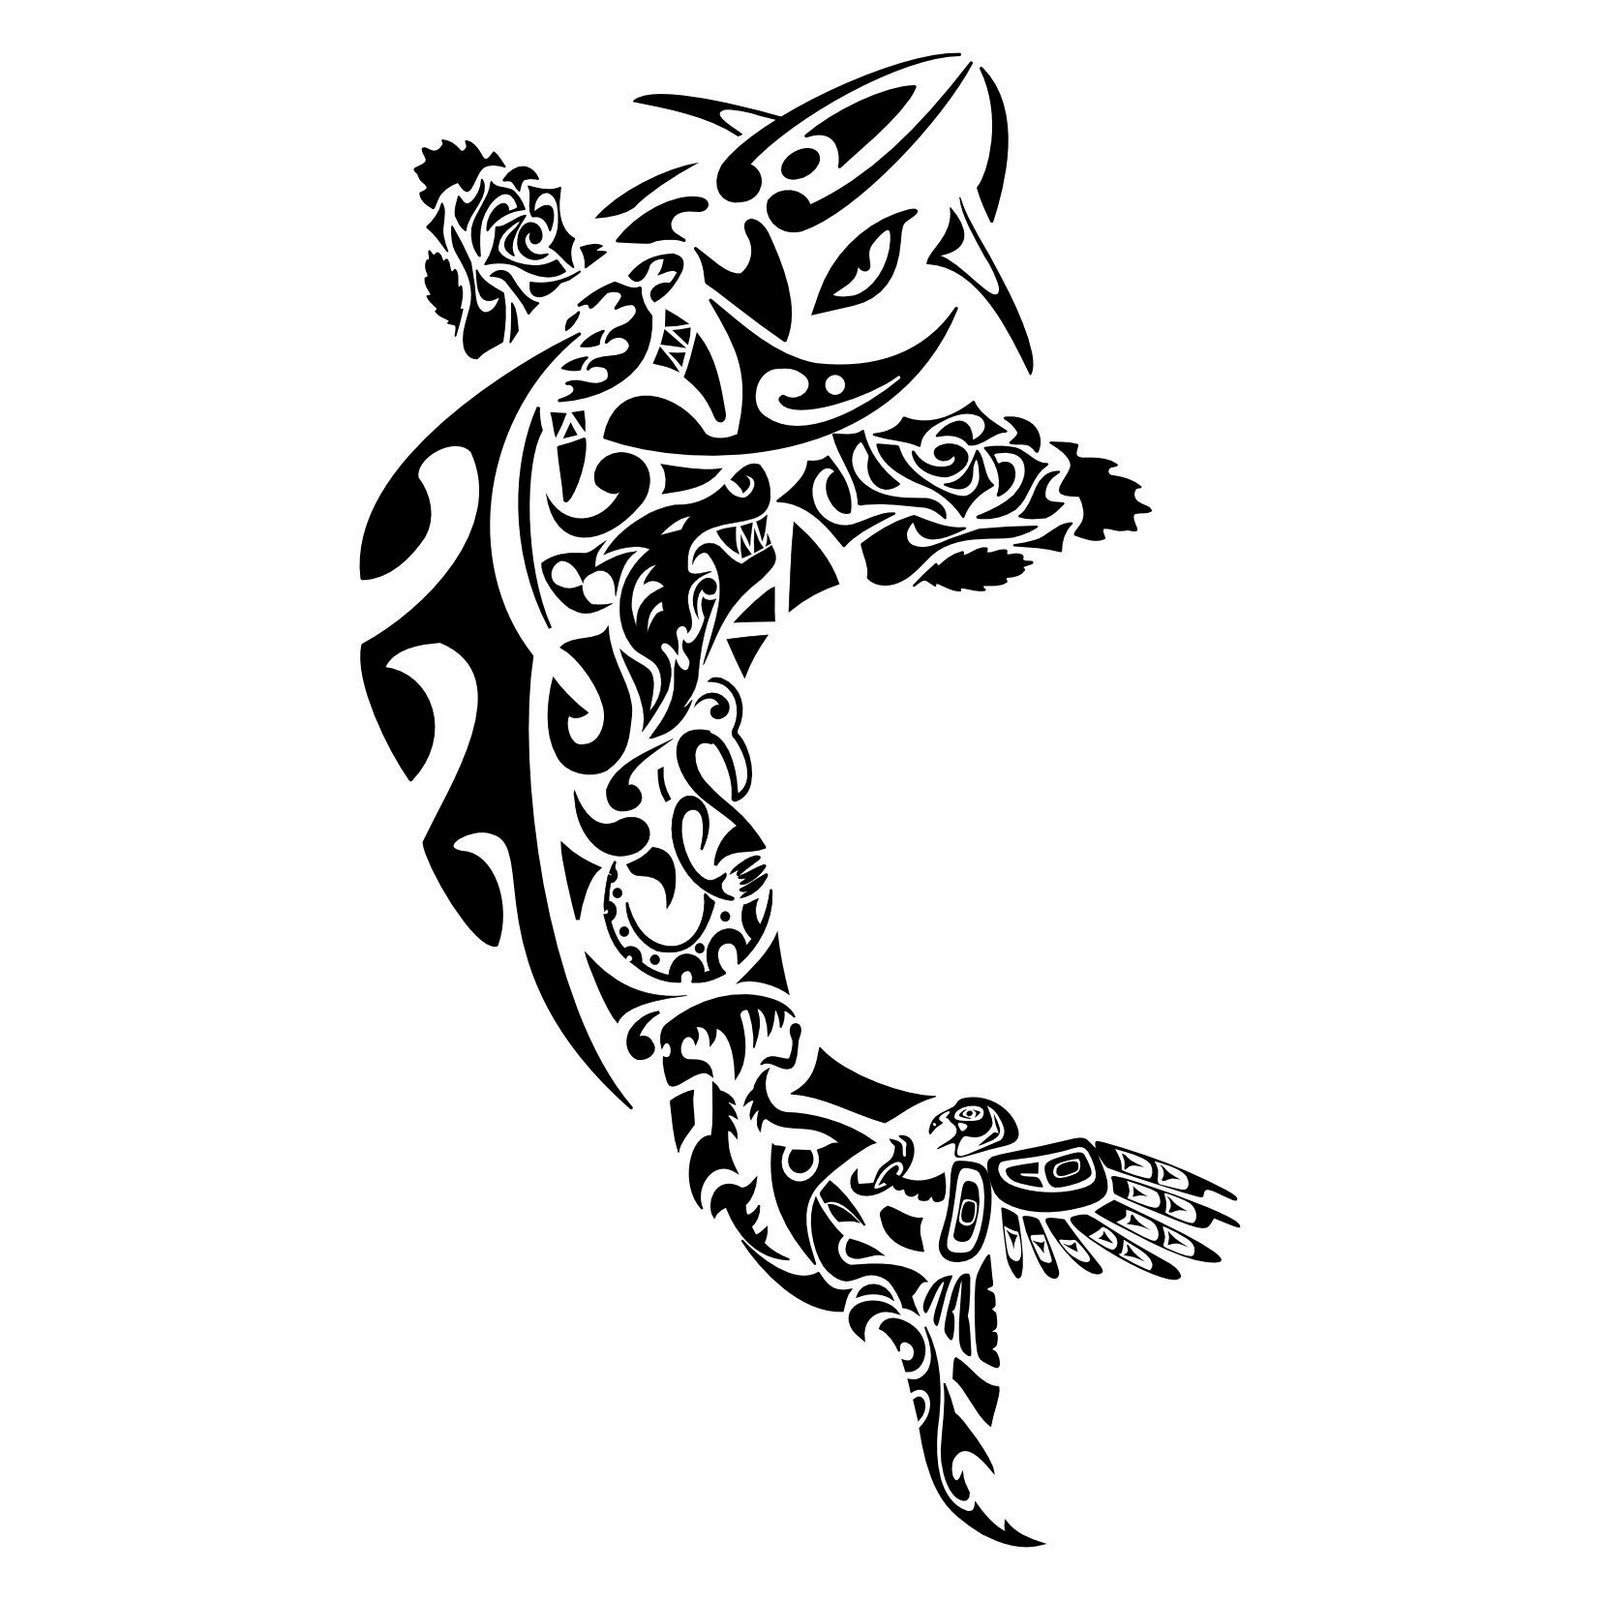 Free vector graphic Celtic Shield Celtic Design  Free